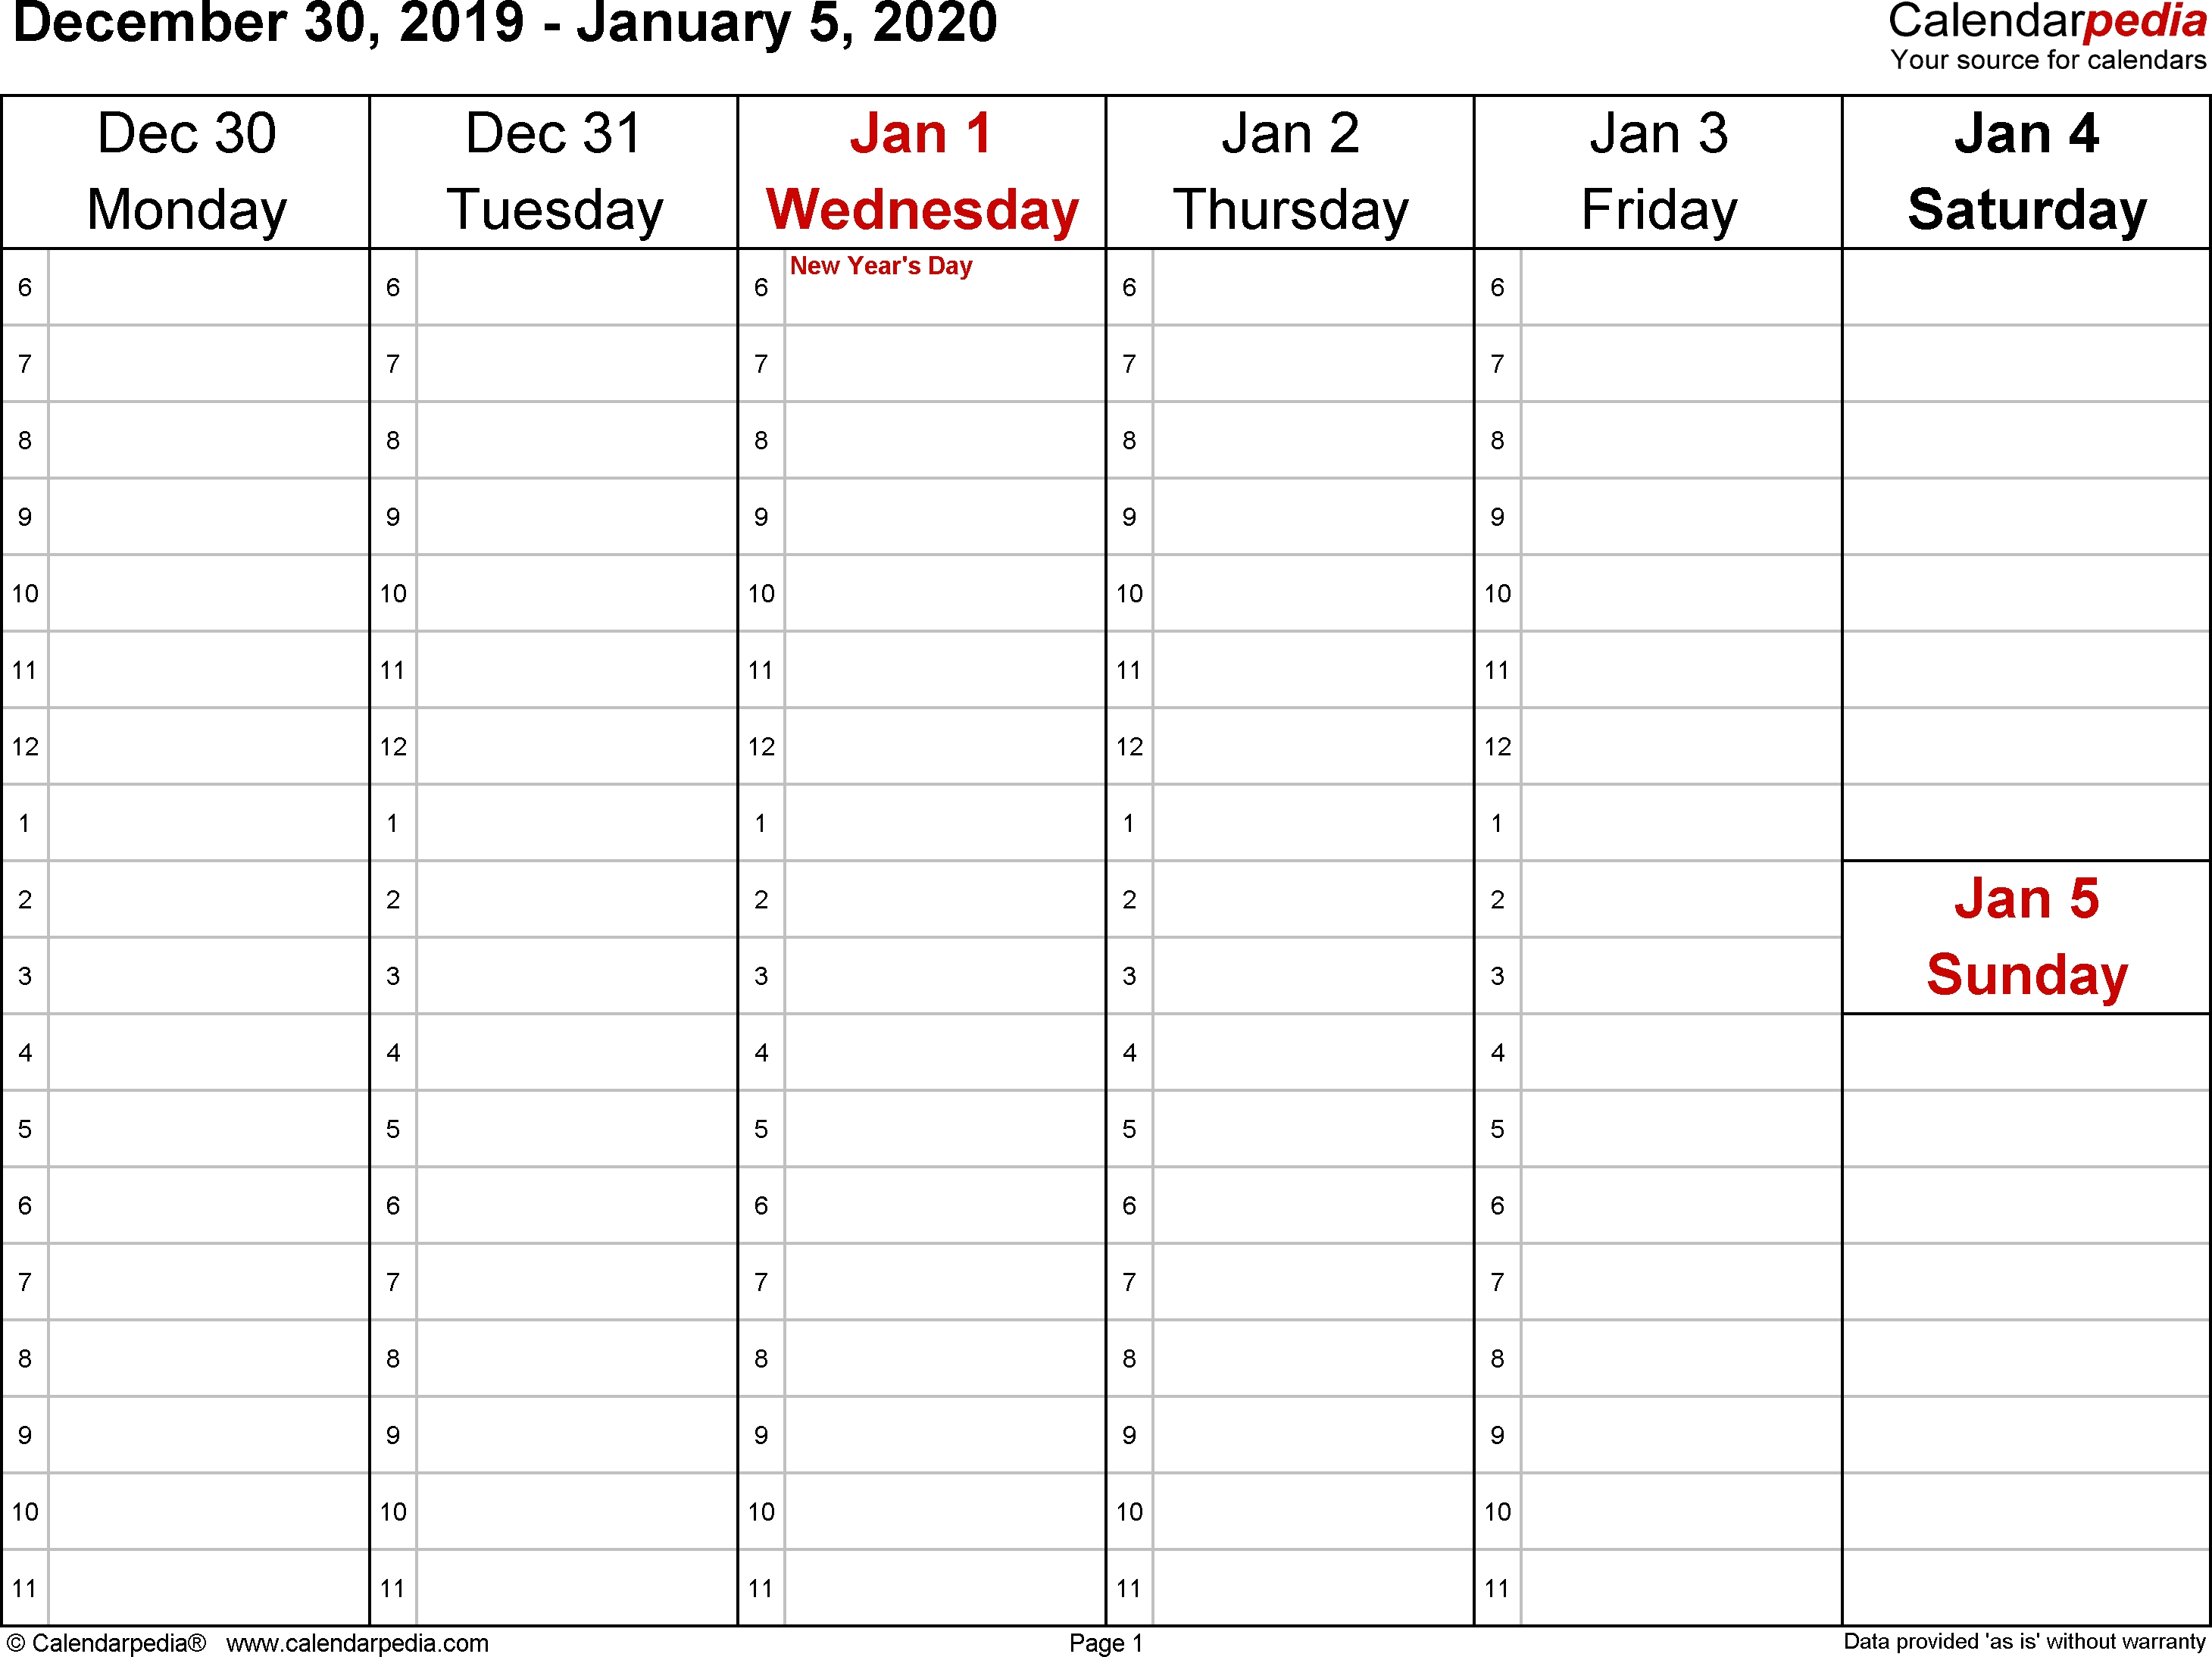 Hourly Calendar Template 2020 - Wpa.wpart.co-Daily Hourly Calendar Template 2020 Printable